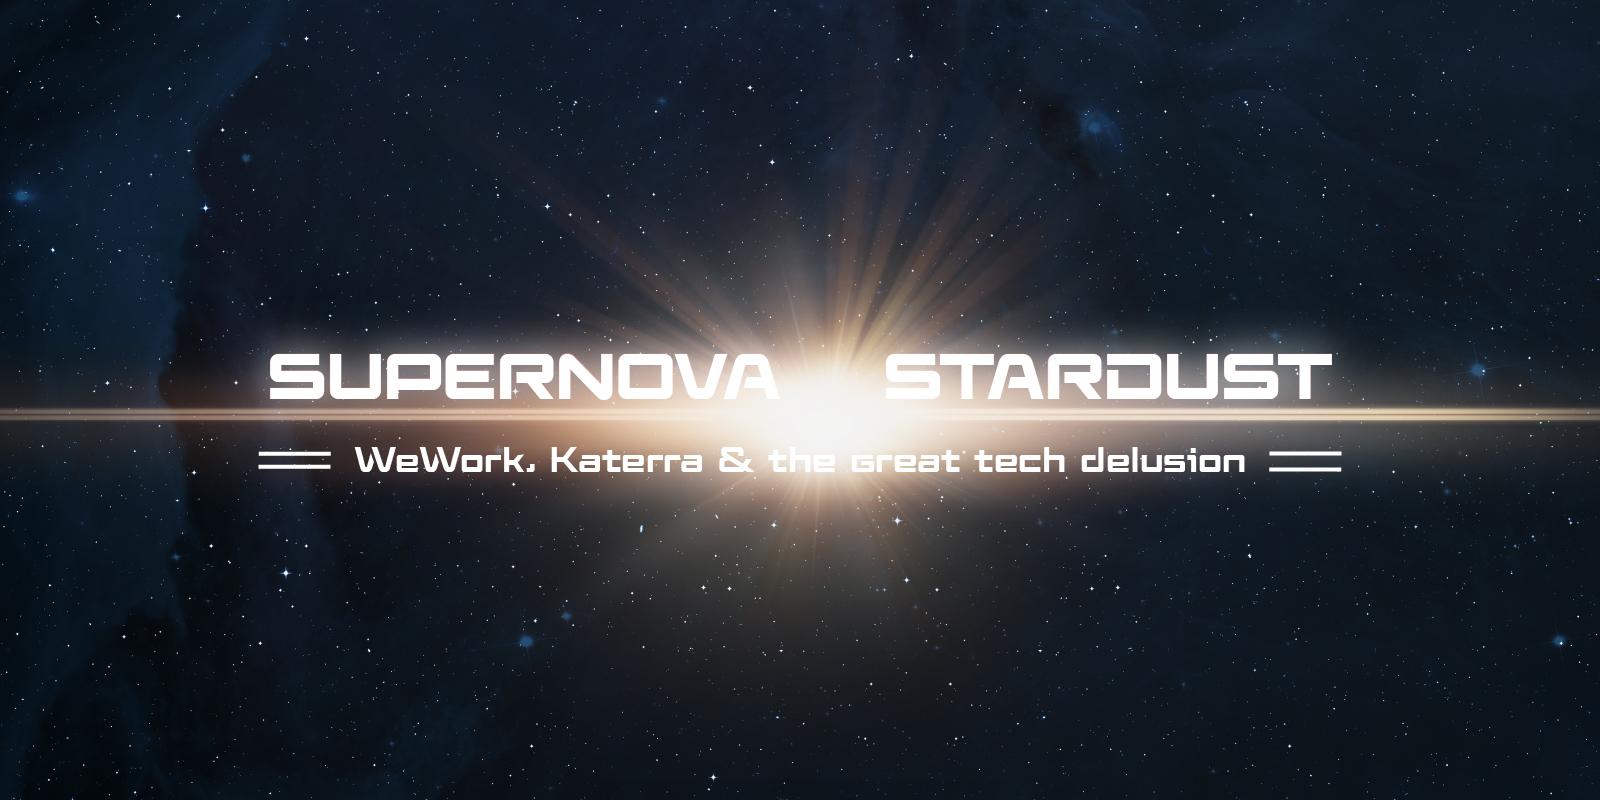 Supernova stardust